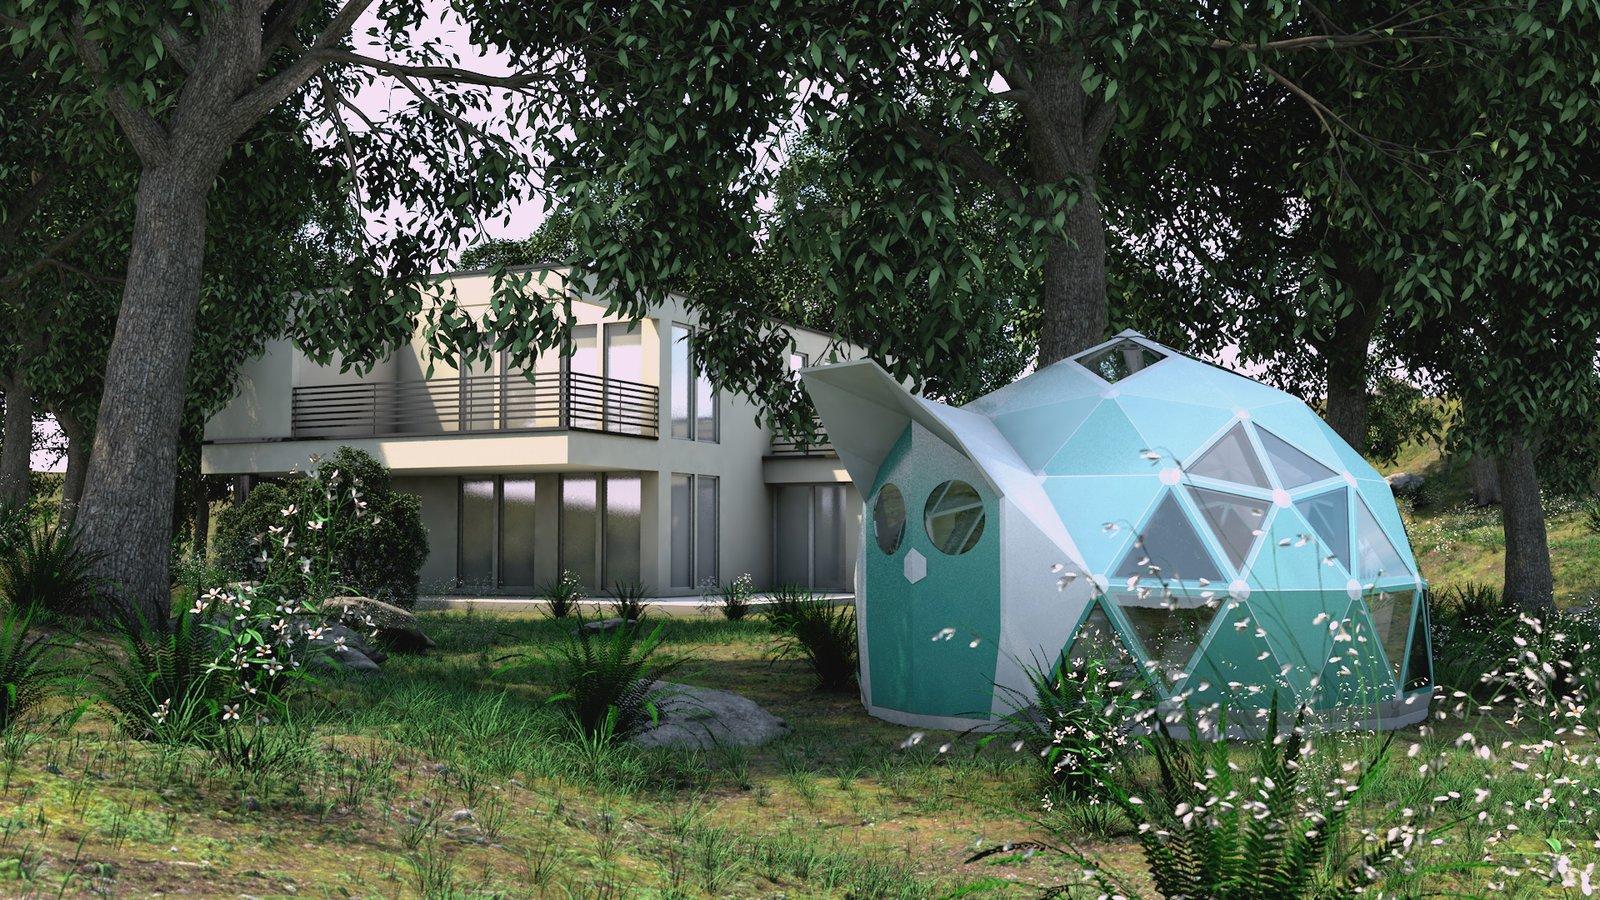 Geoship geodesic dome homes